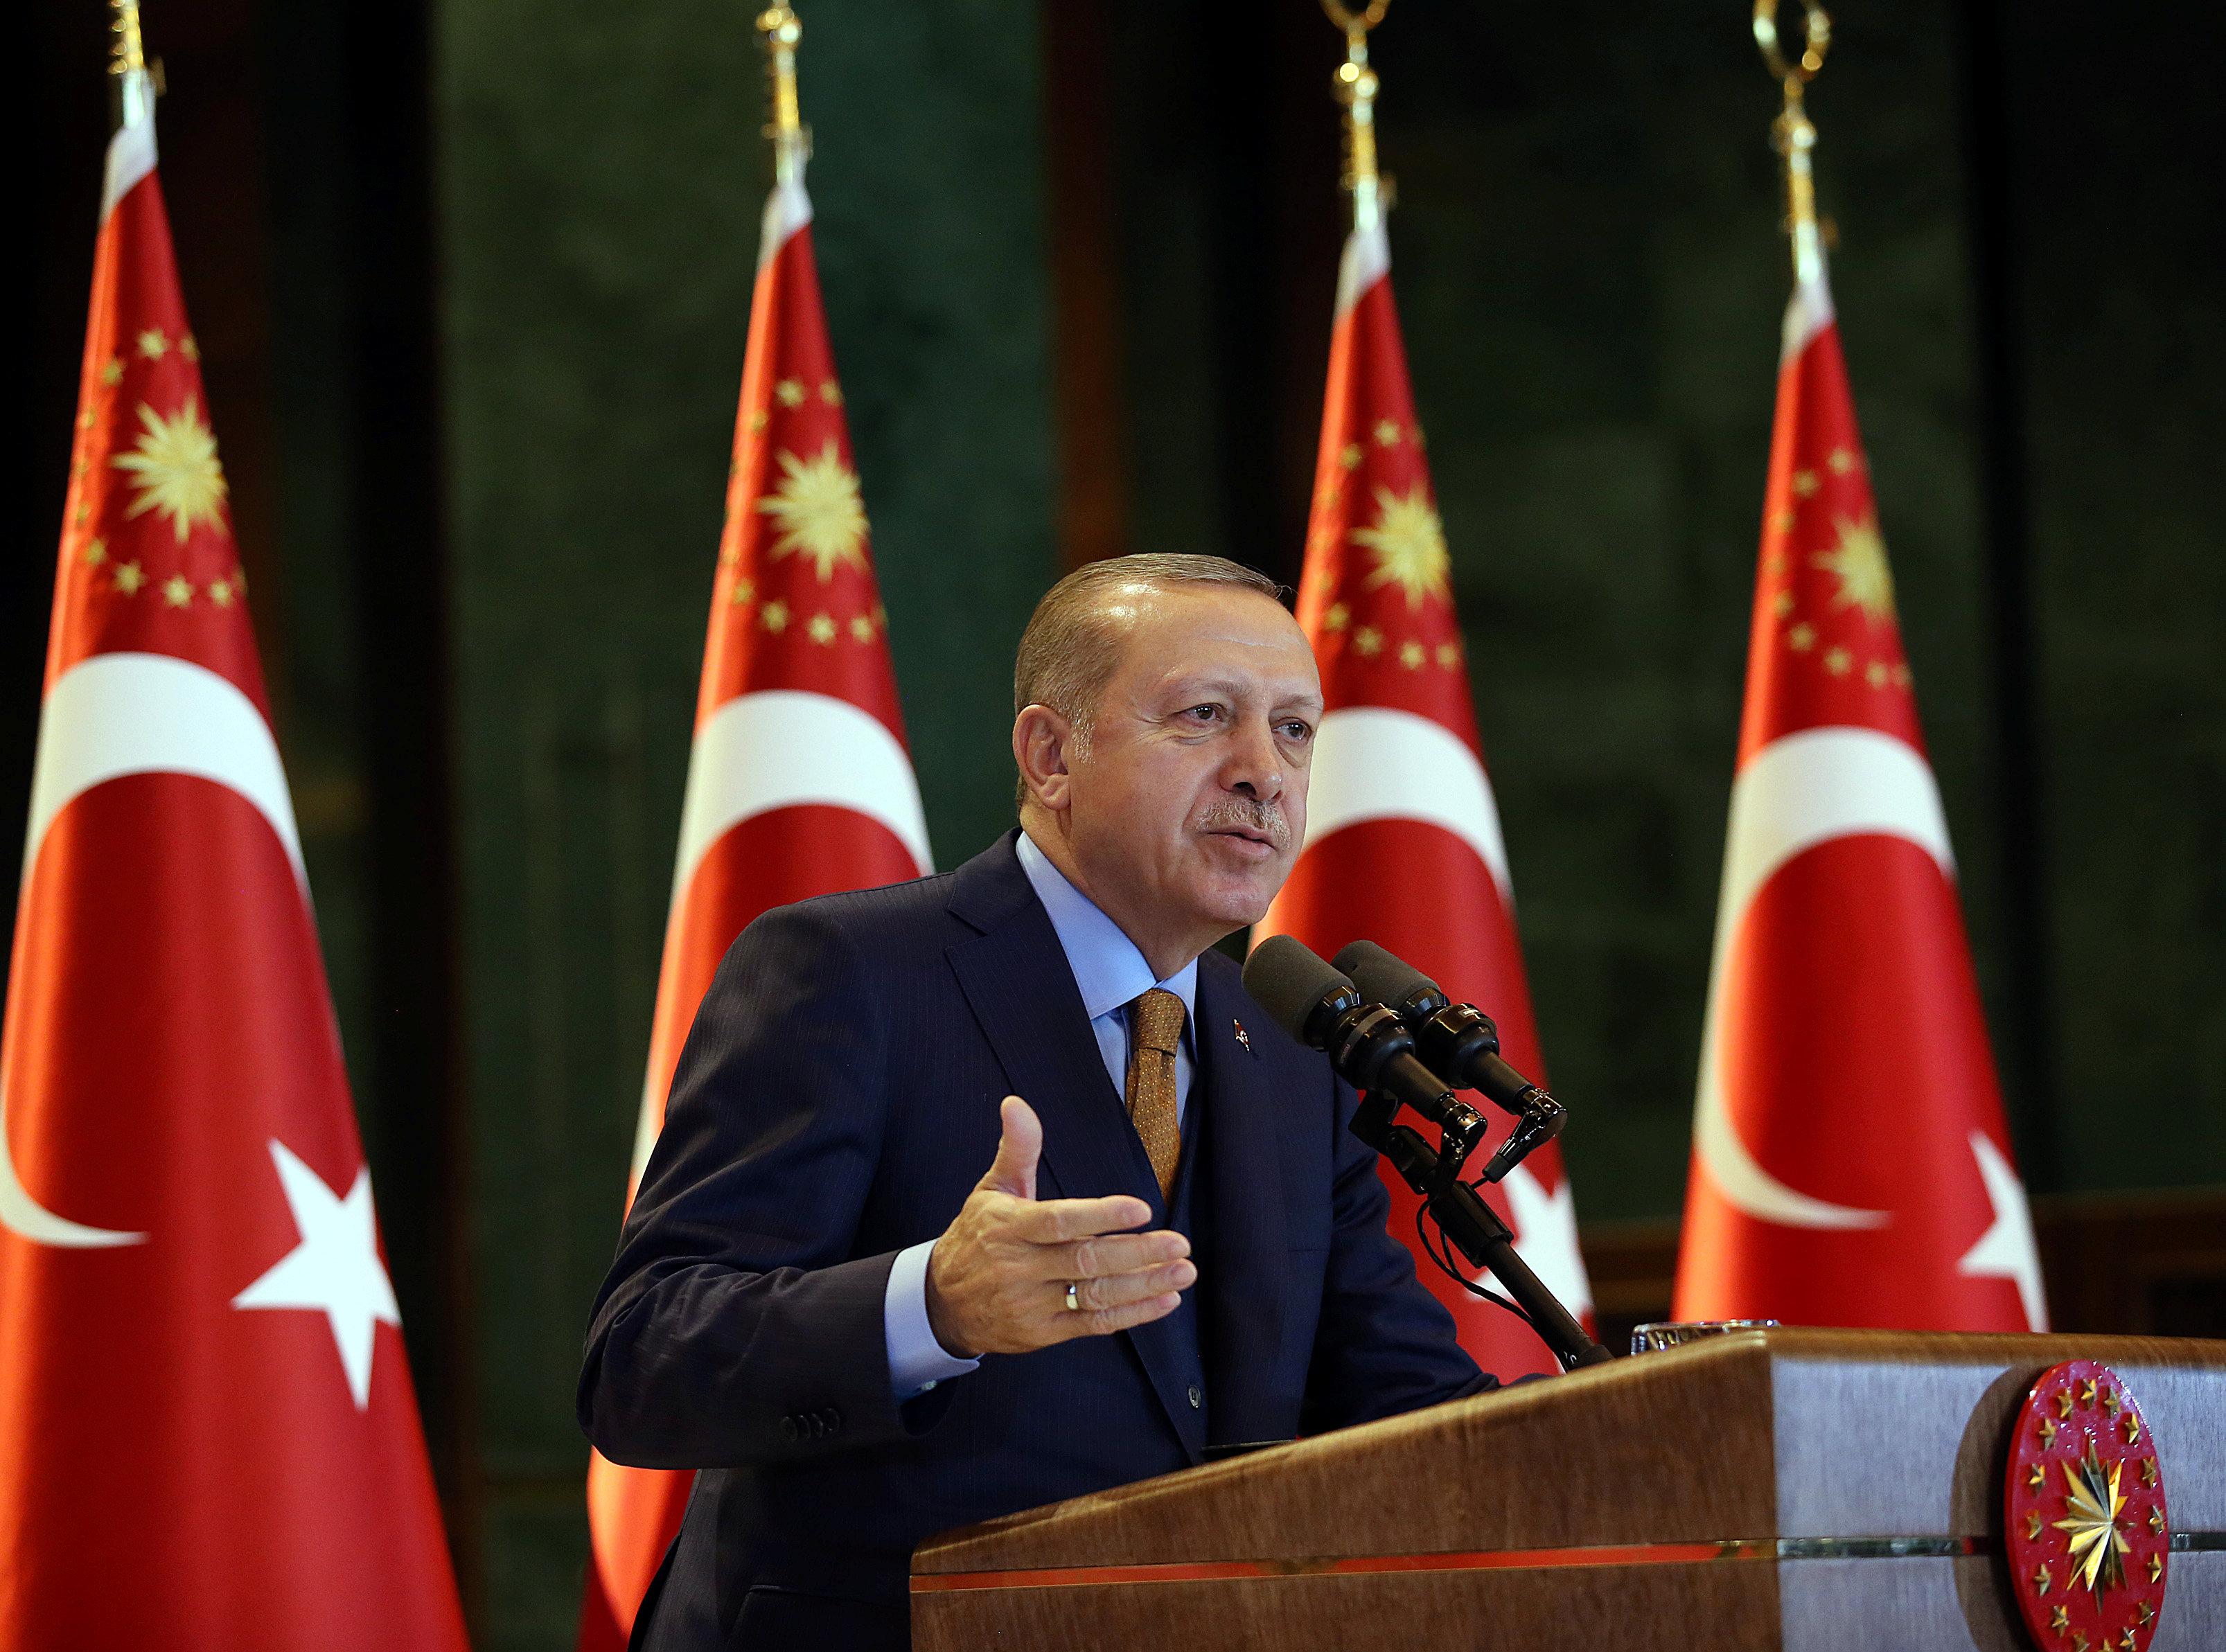 Turkish President Tayyip Erdogan speaks during a meeting at the Presidential Palace in Ankara, Turkey, January 10, 2018